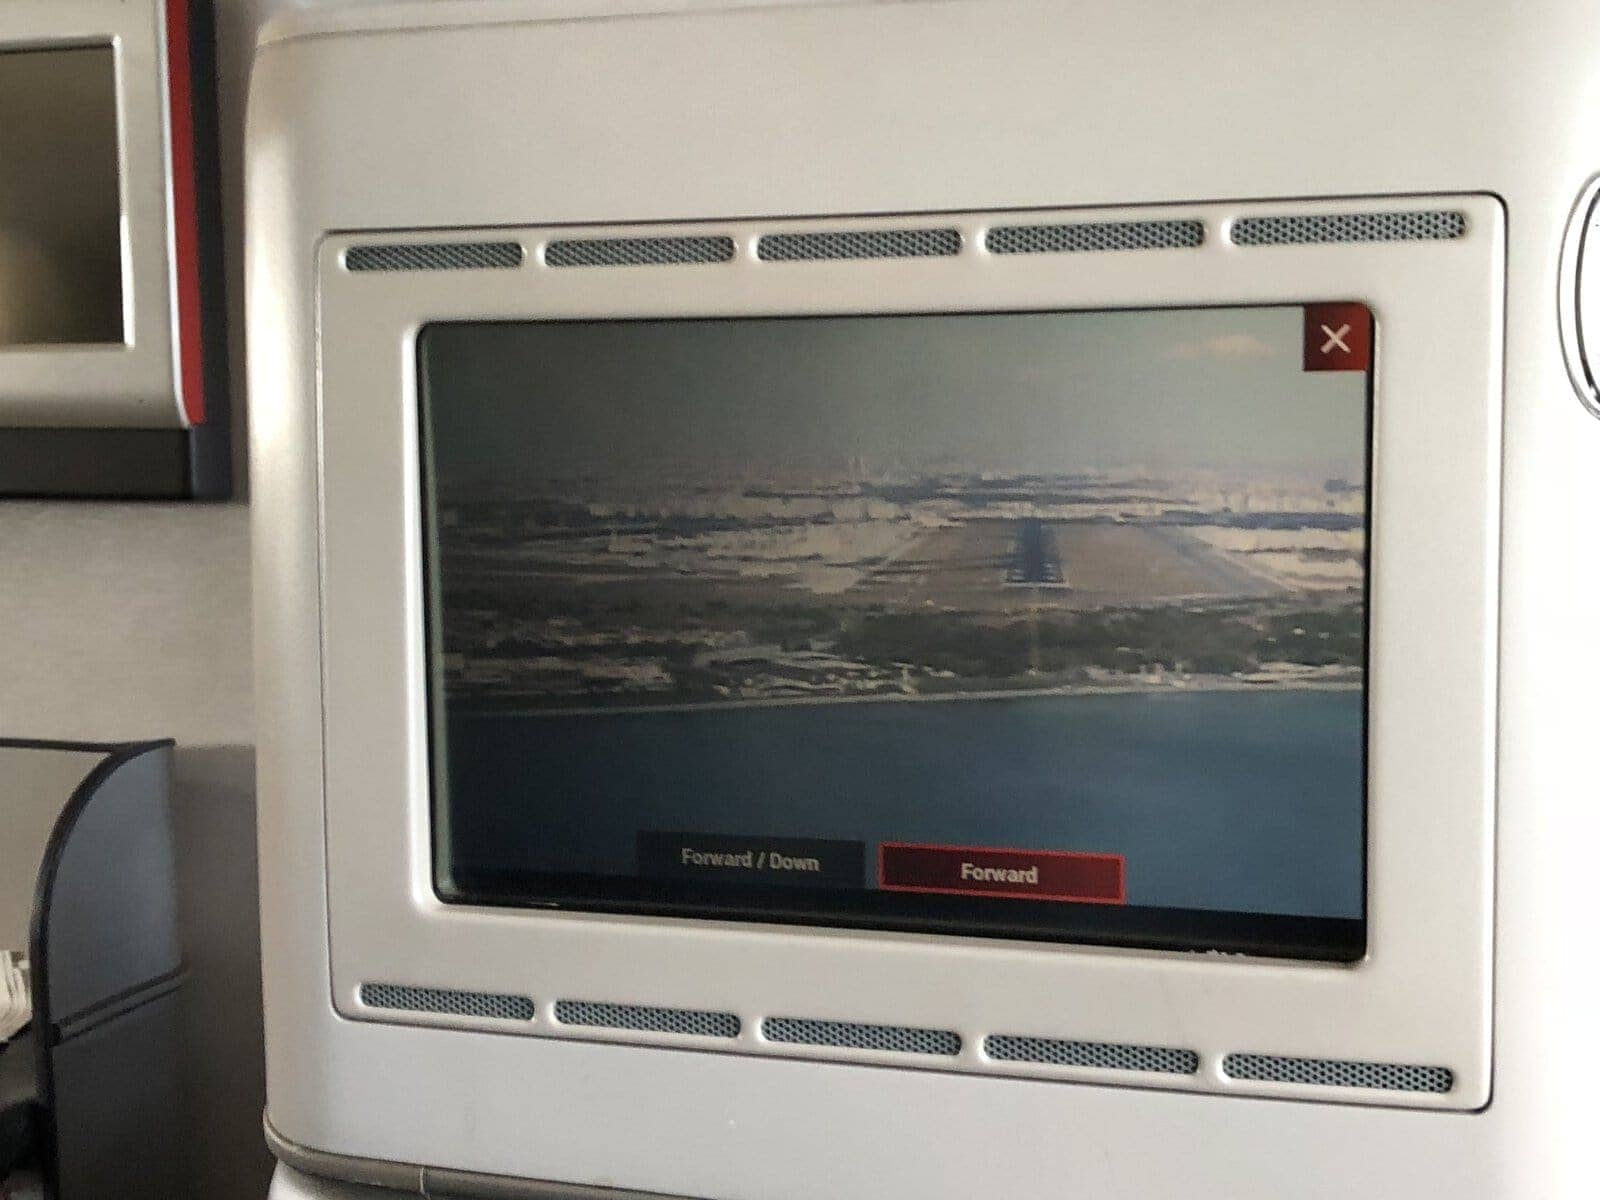 boston istanbul turkish arlines classe affaires 67